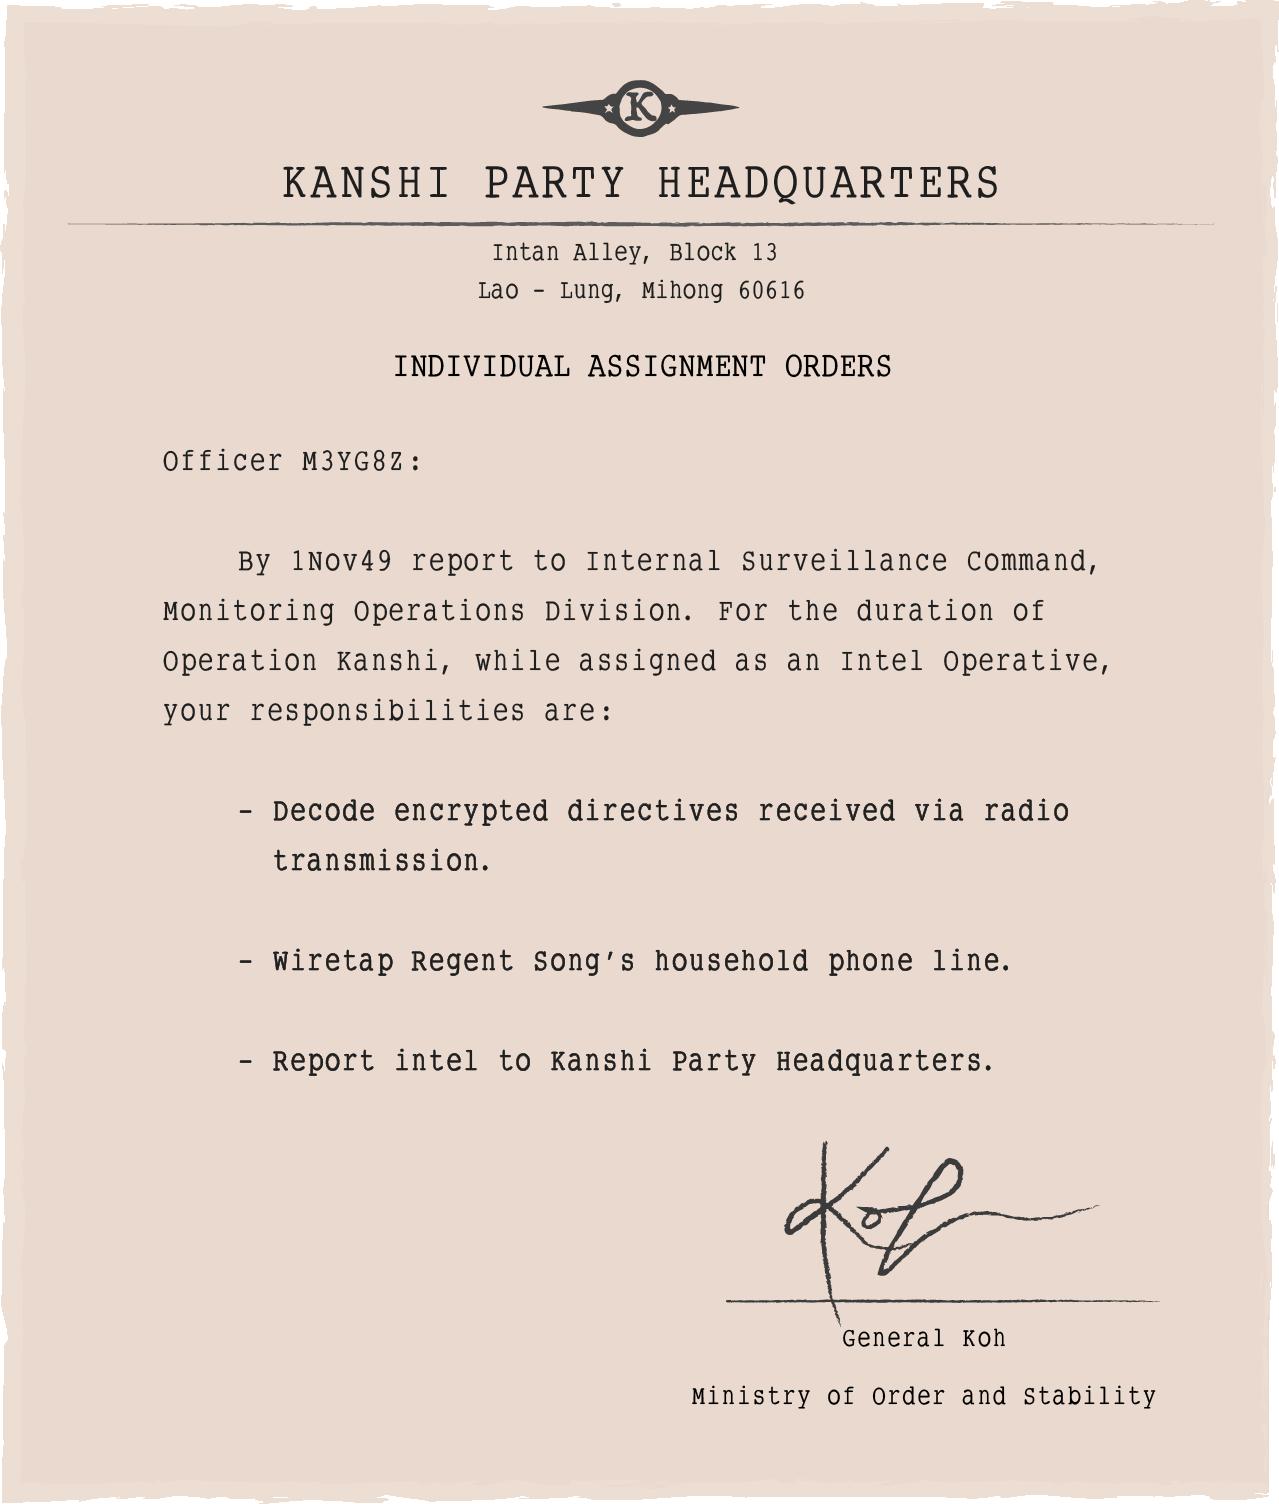 Decoding Encrypted Radio Transmissions